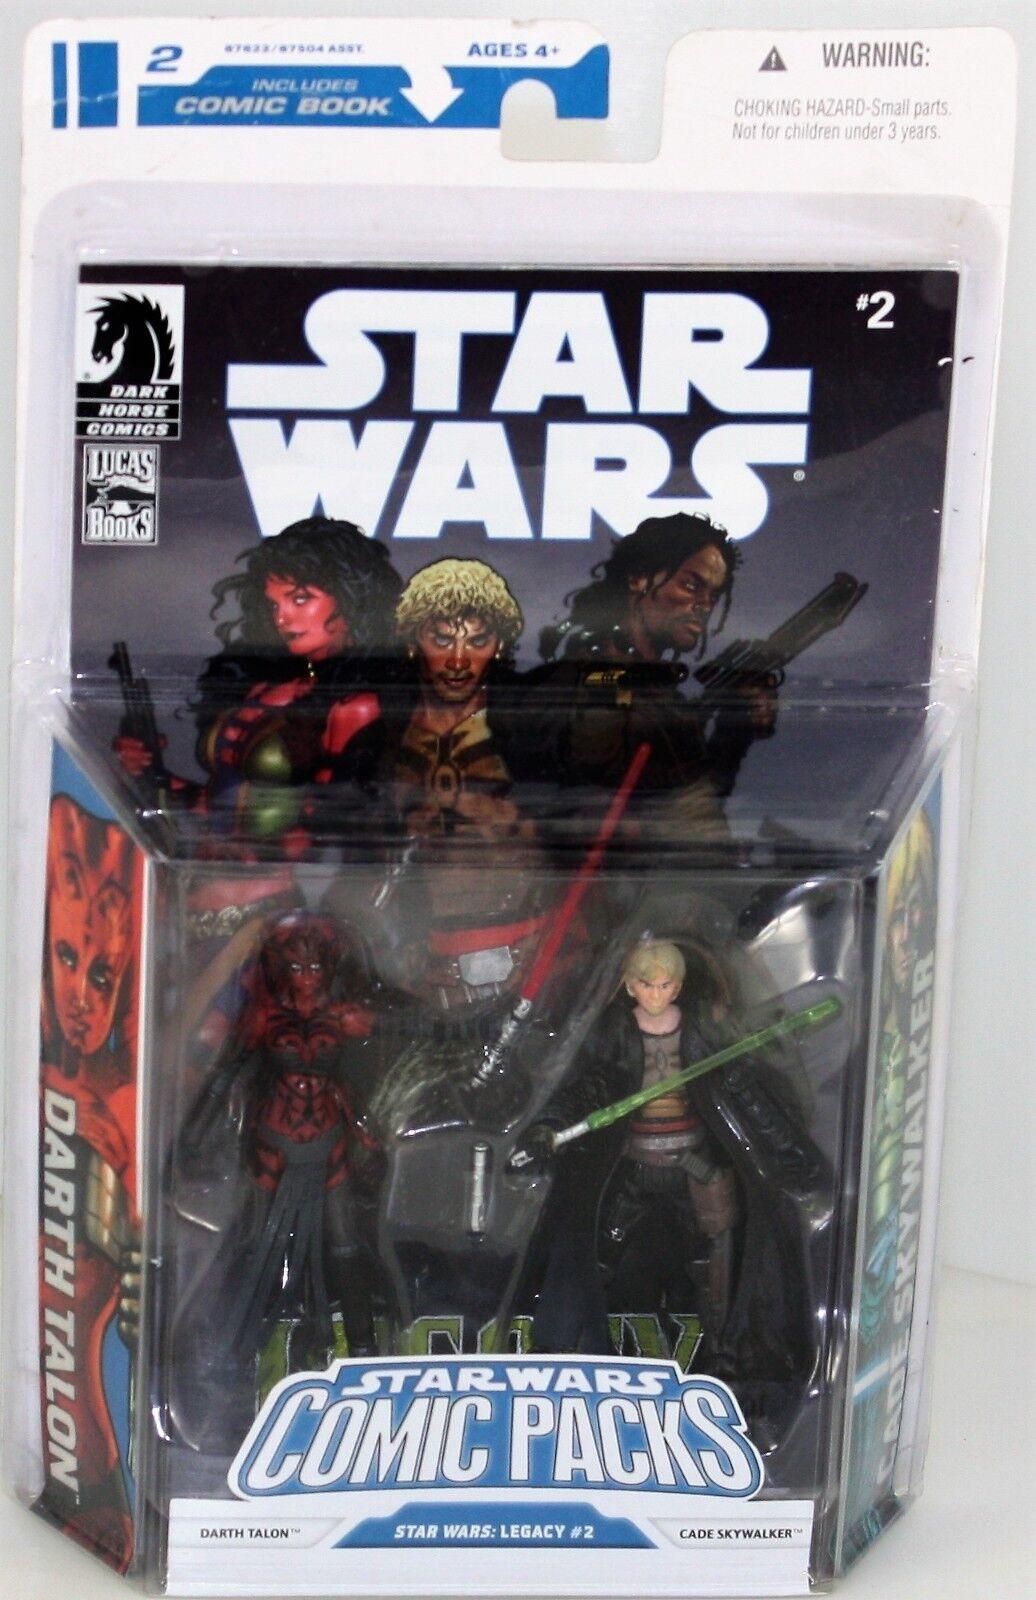 Darth Talon & Cade Skywalker-Hasbro Estrella Wars Comic Packs Figura Set